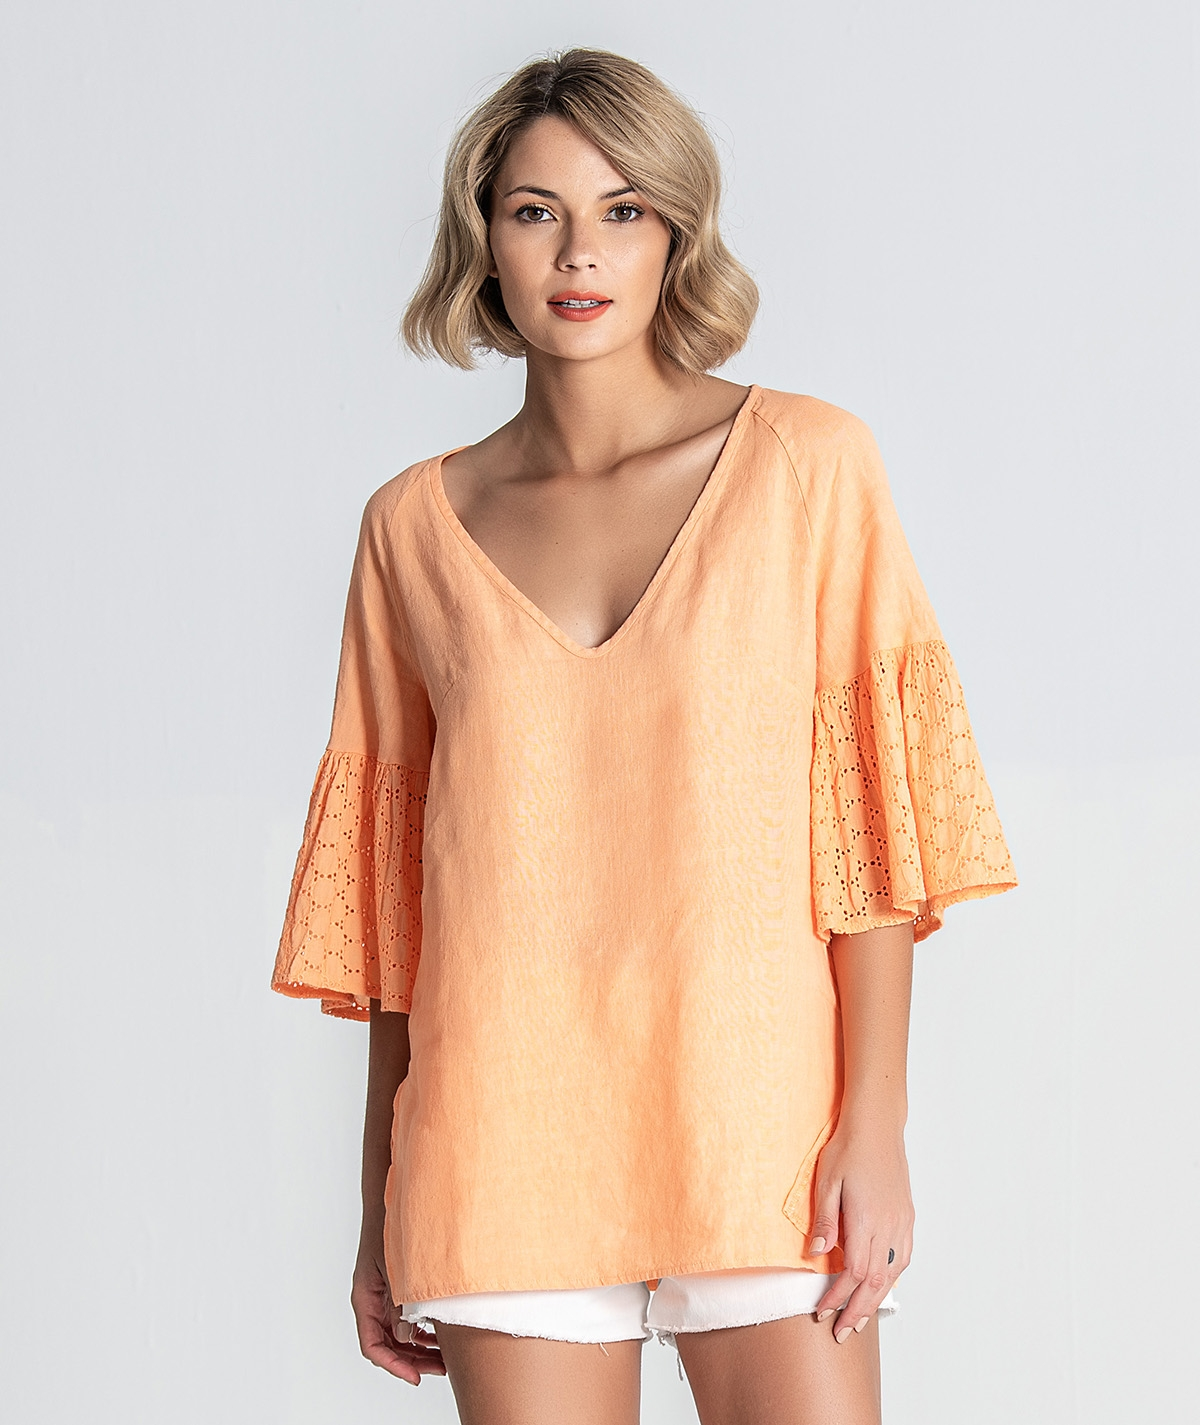 Blusa com manga bordada